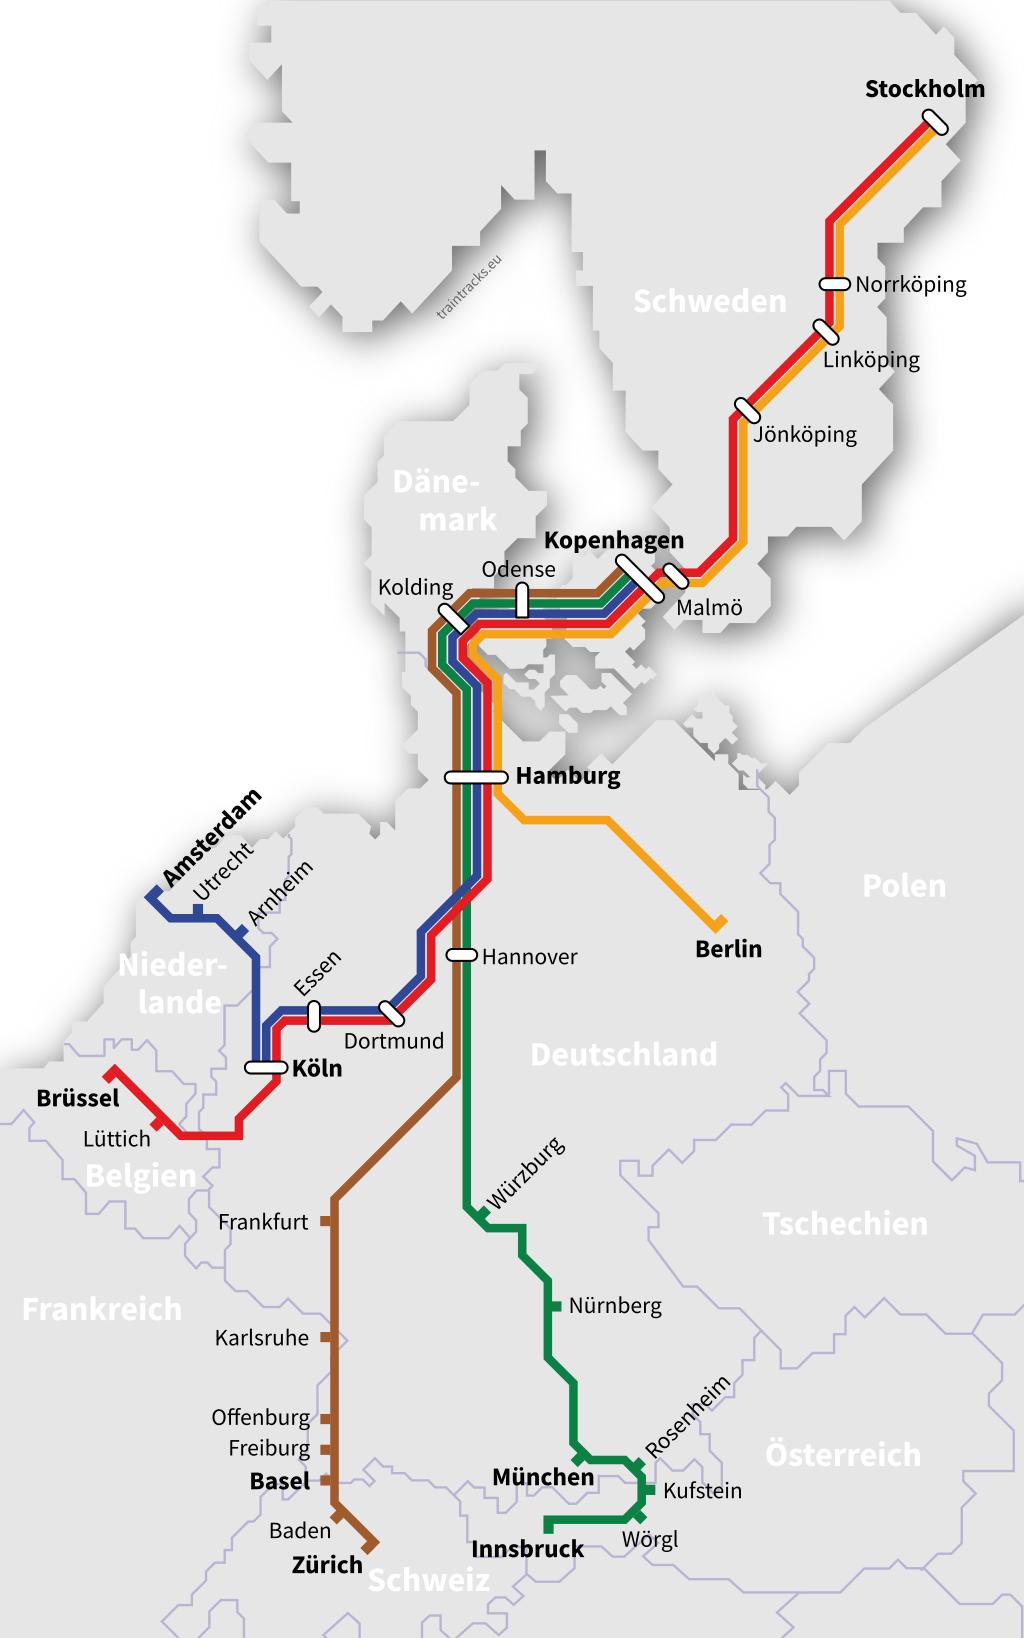 Karte Nachtzug Netz Dänemark Schweden Kopenhagen Stockholm Hamburg Berlin Amsterdam Köln Brüssel München Basel Zürich Innsbruck